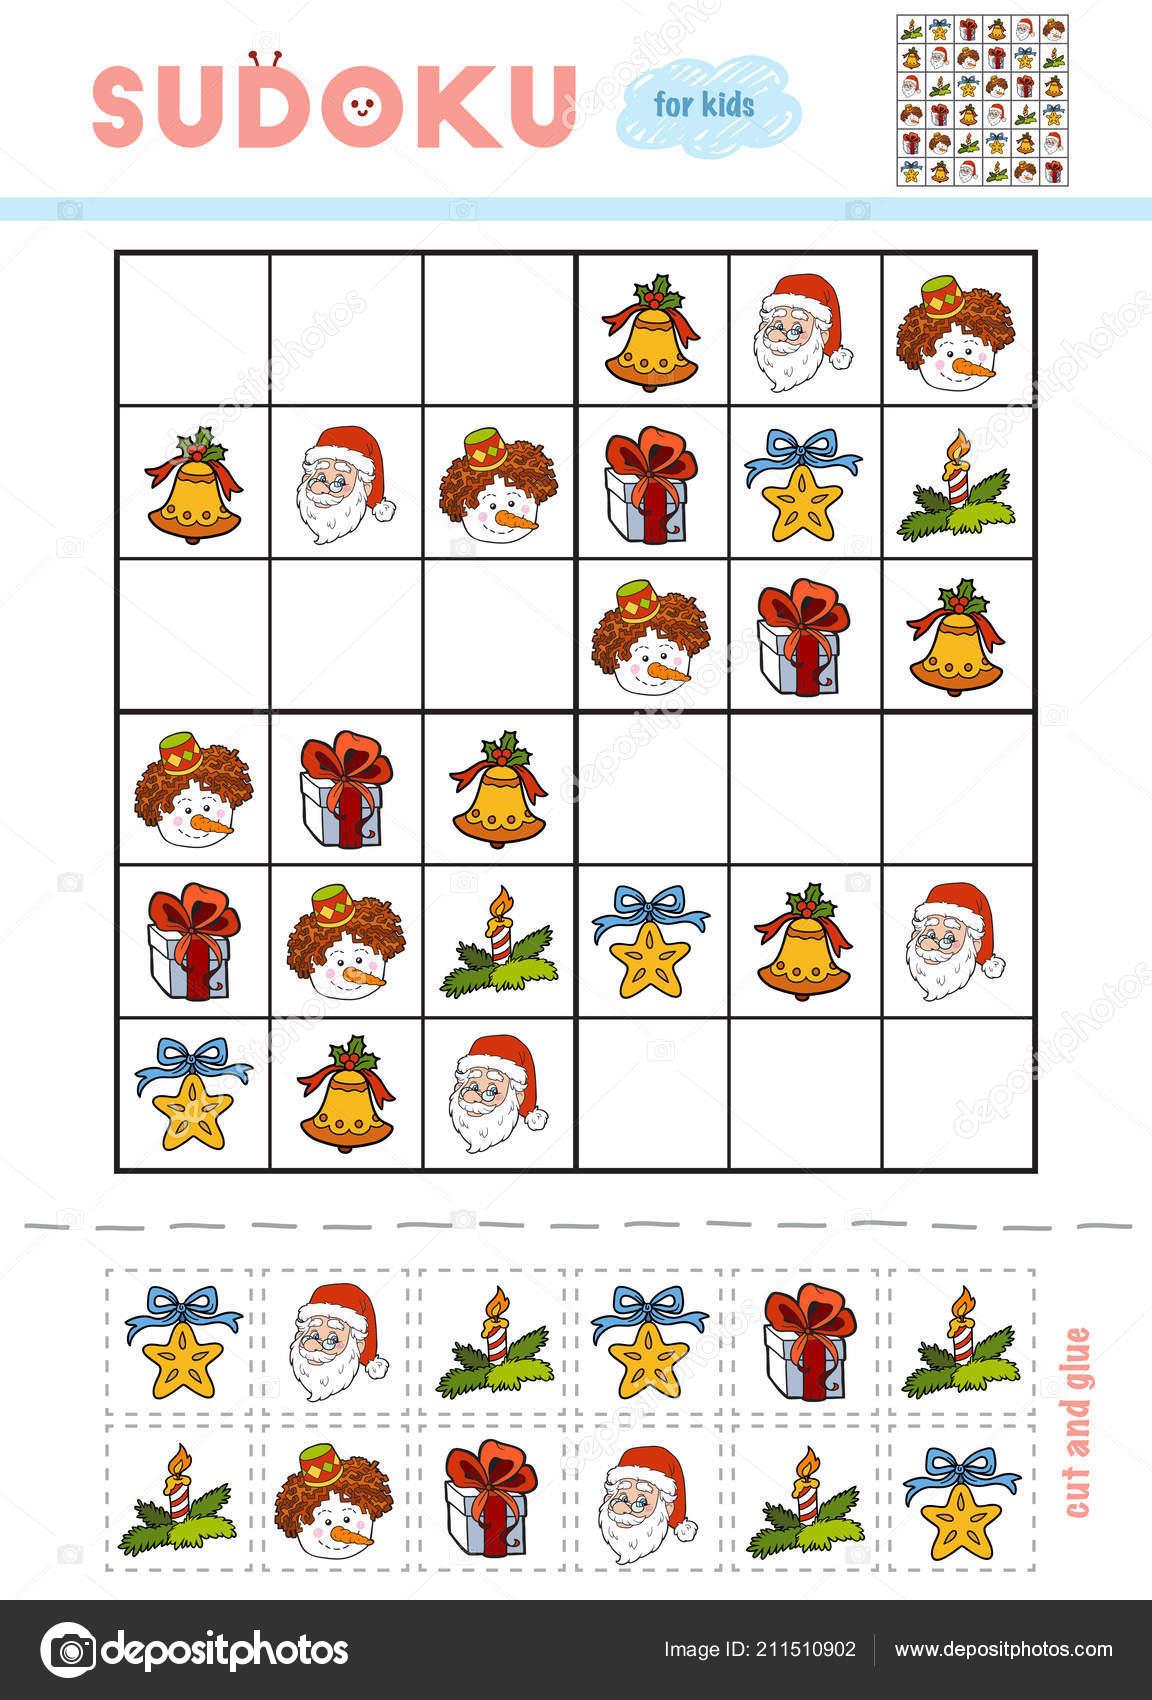 Christmas Sudoku.Sudoku Children Education Game Set Christmas Items Bell